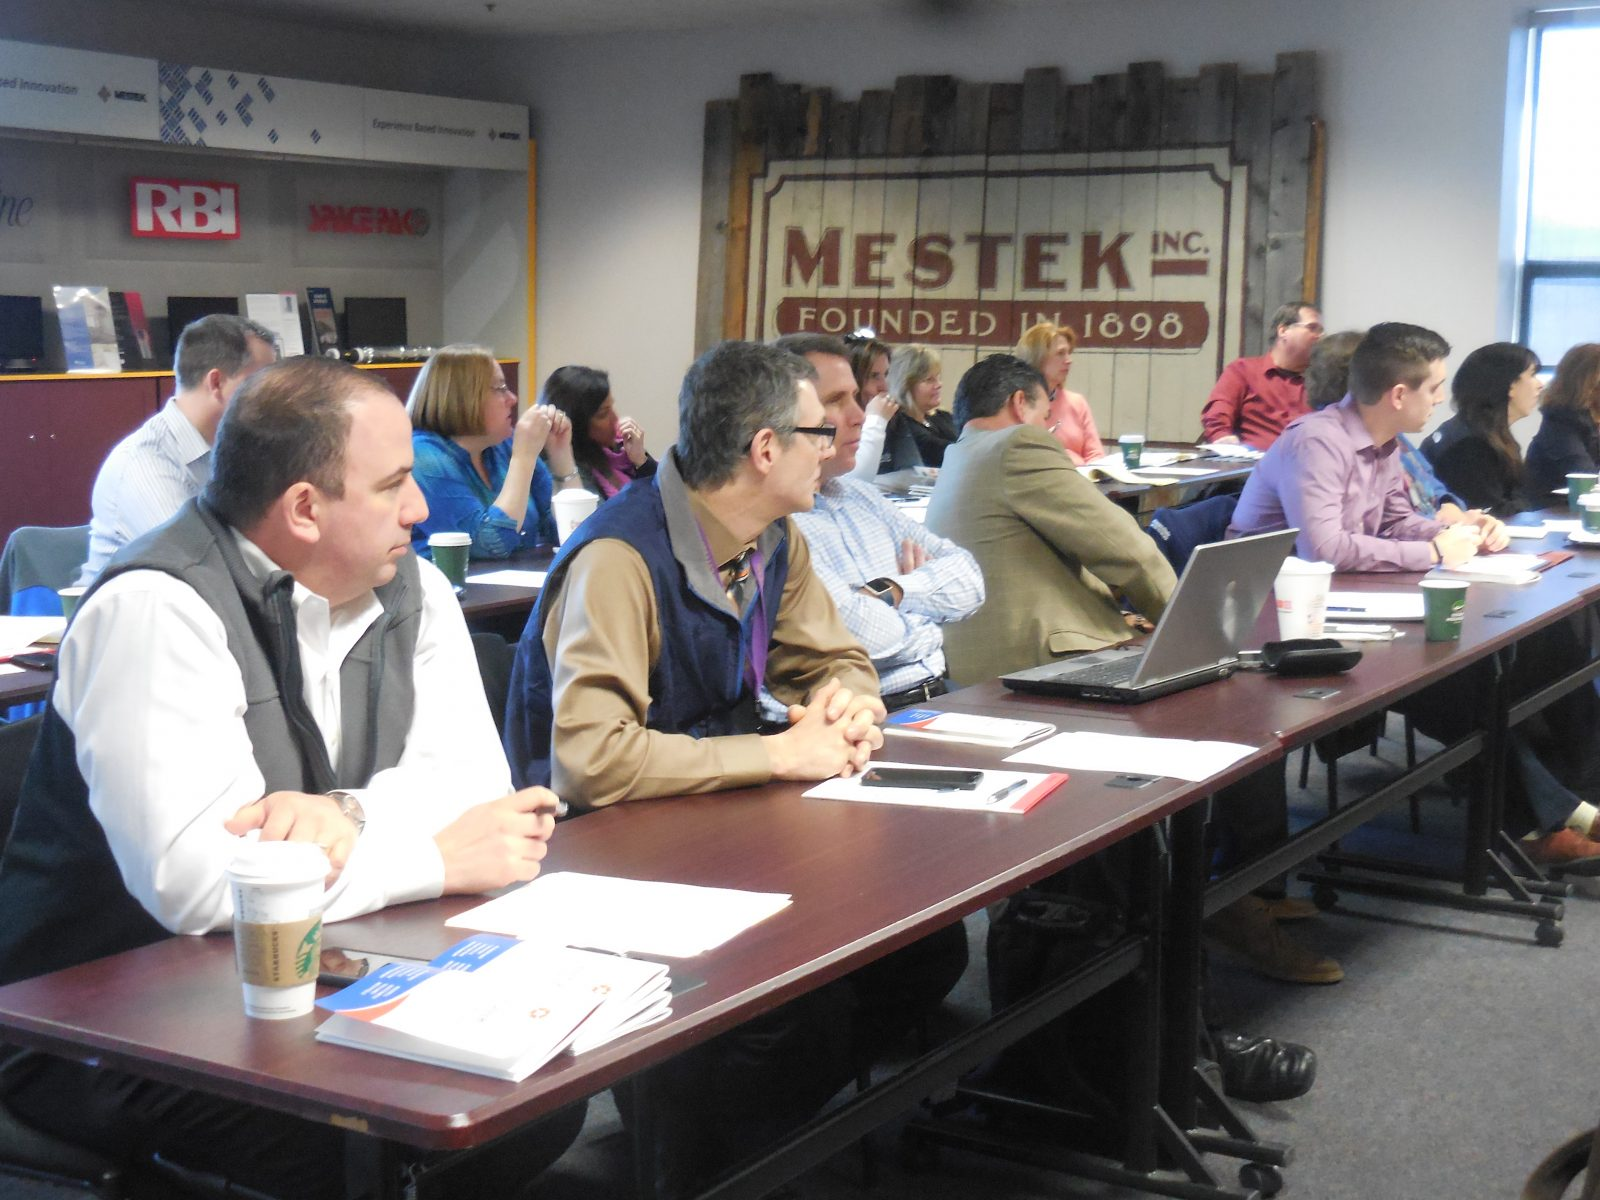 Westfield Education 2 Business Alliance to set up mentoring program